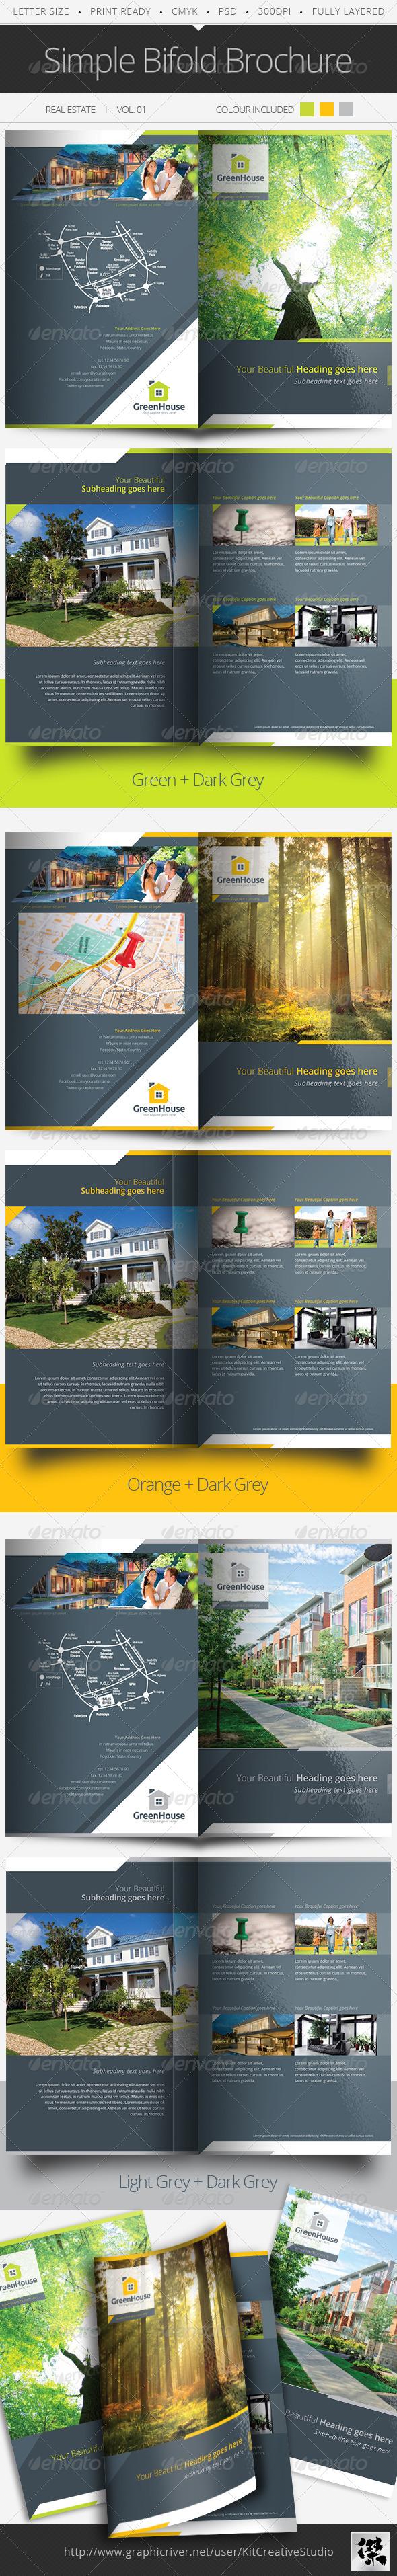 GraphicRiver Simple Bifold Brochure Vol.01 5683690